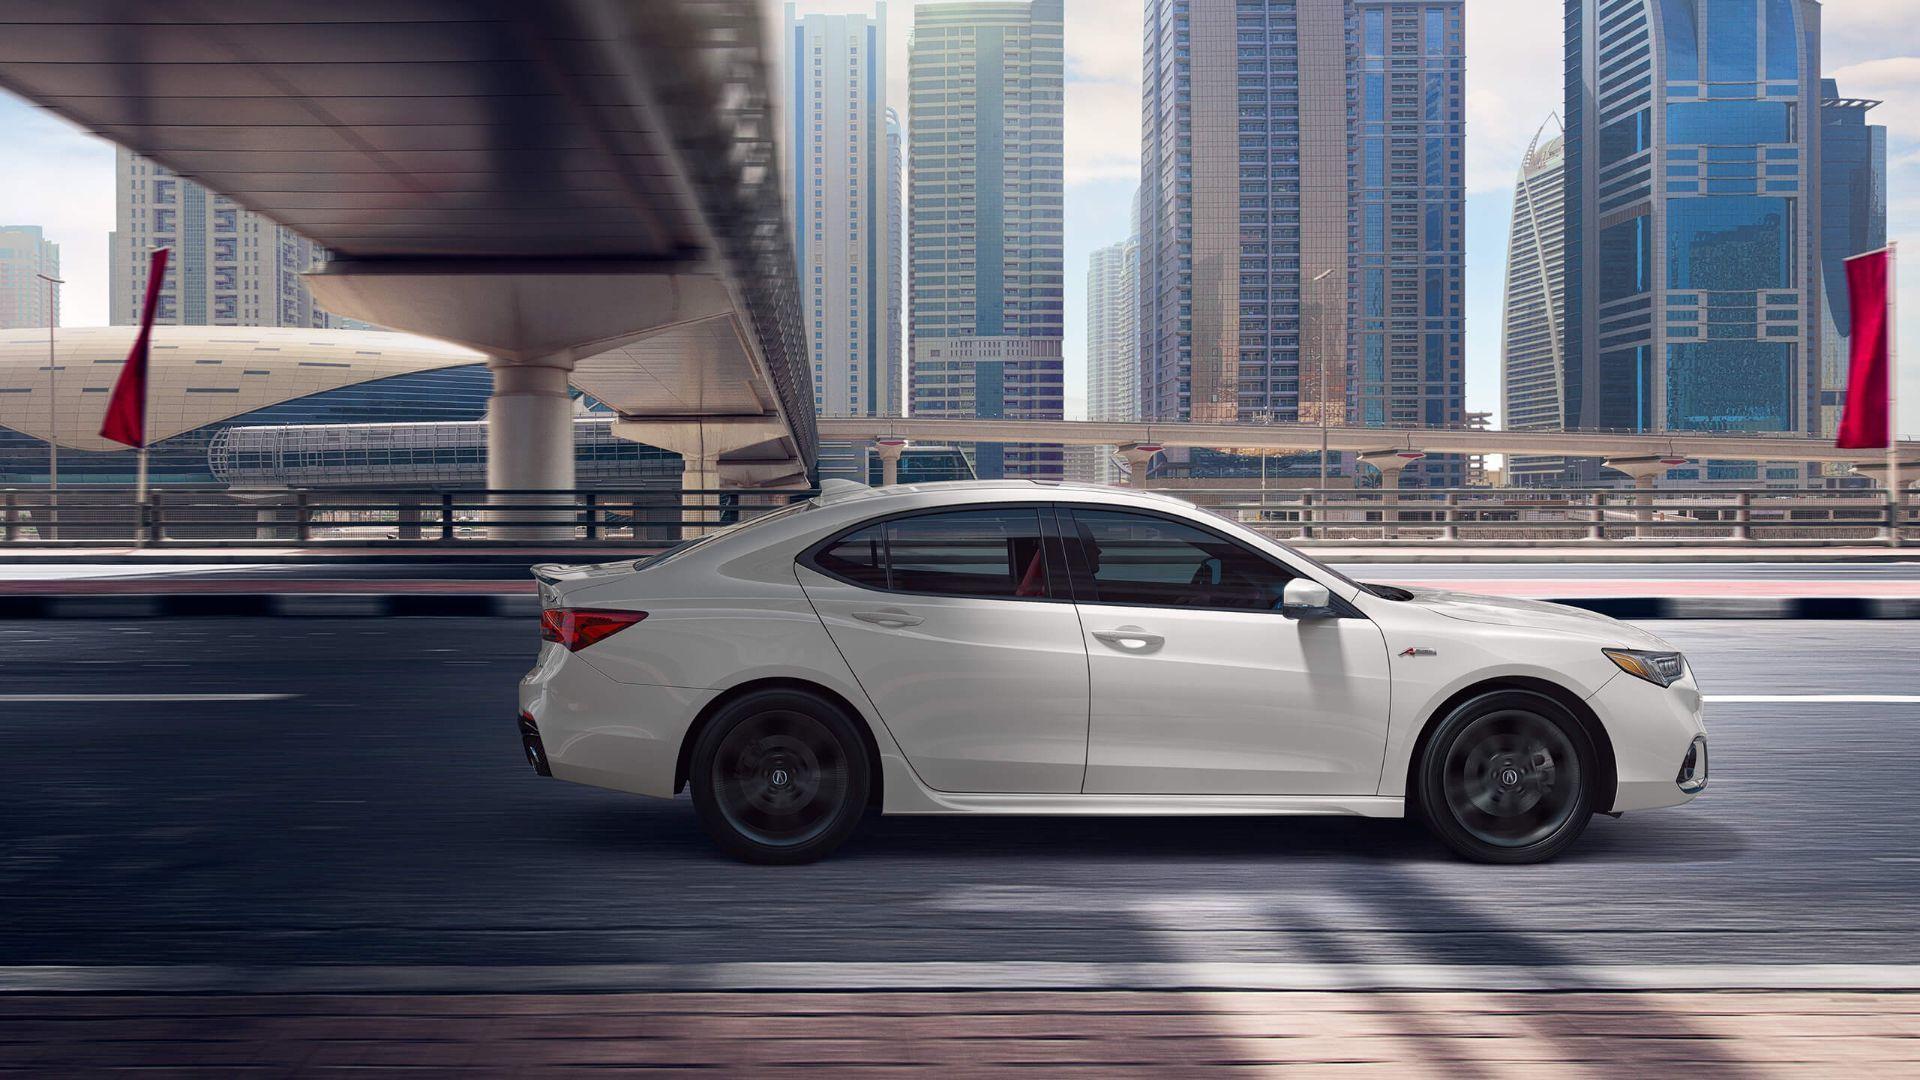 The 2020 Acura TLX Sedan: Power and Precision